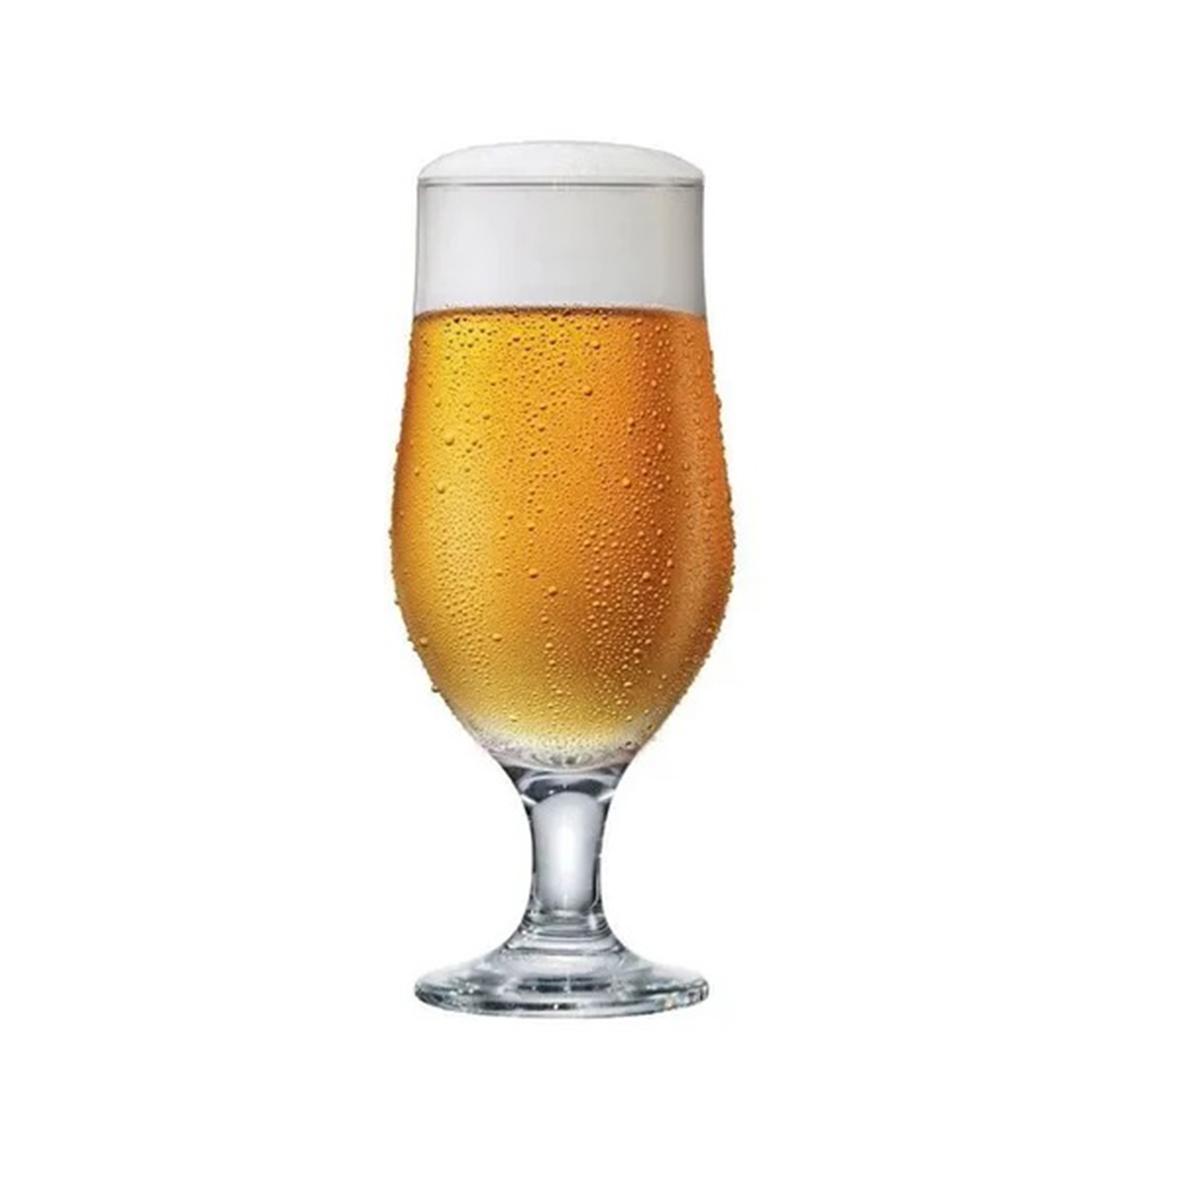 Jogo 4 Taças para Cerveja 330 ml  - Lemis